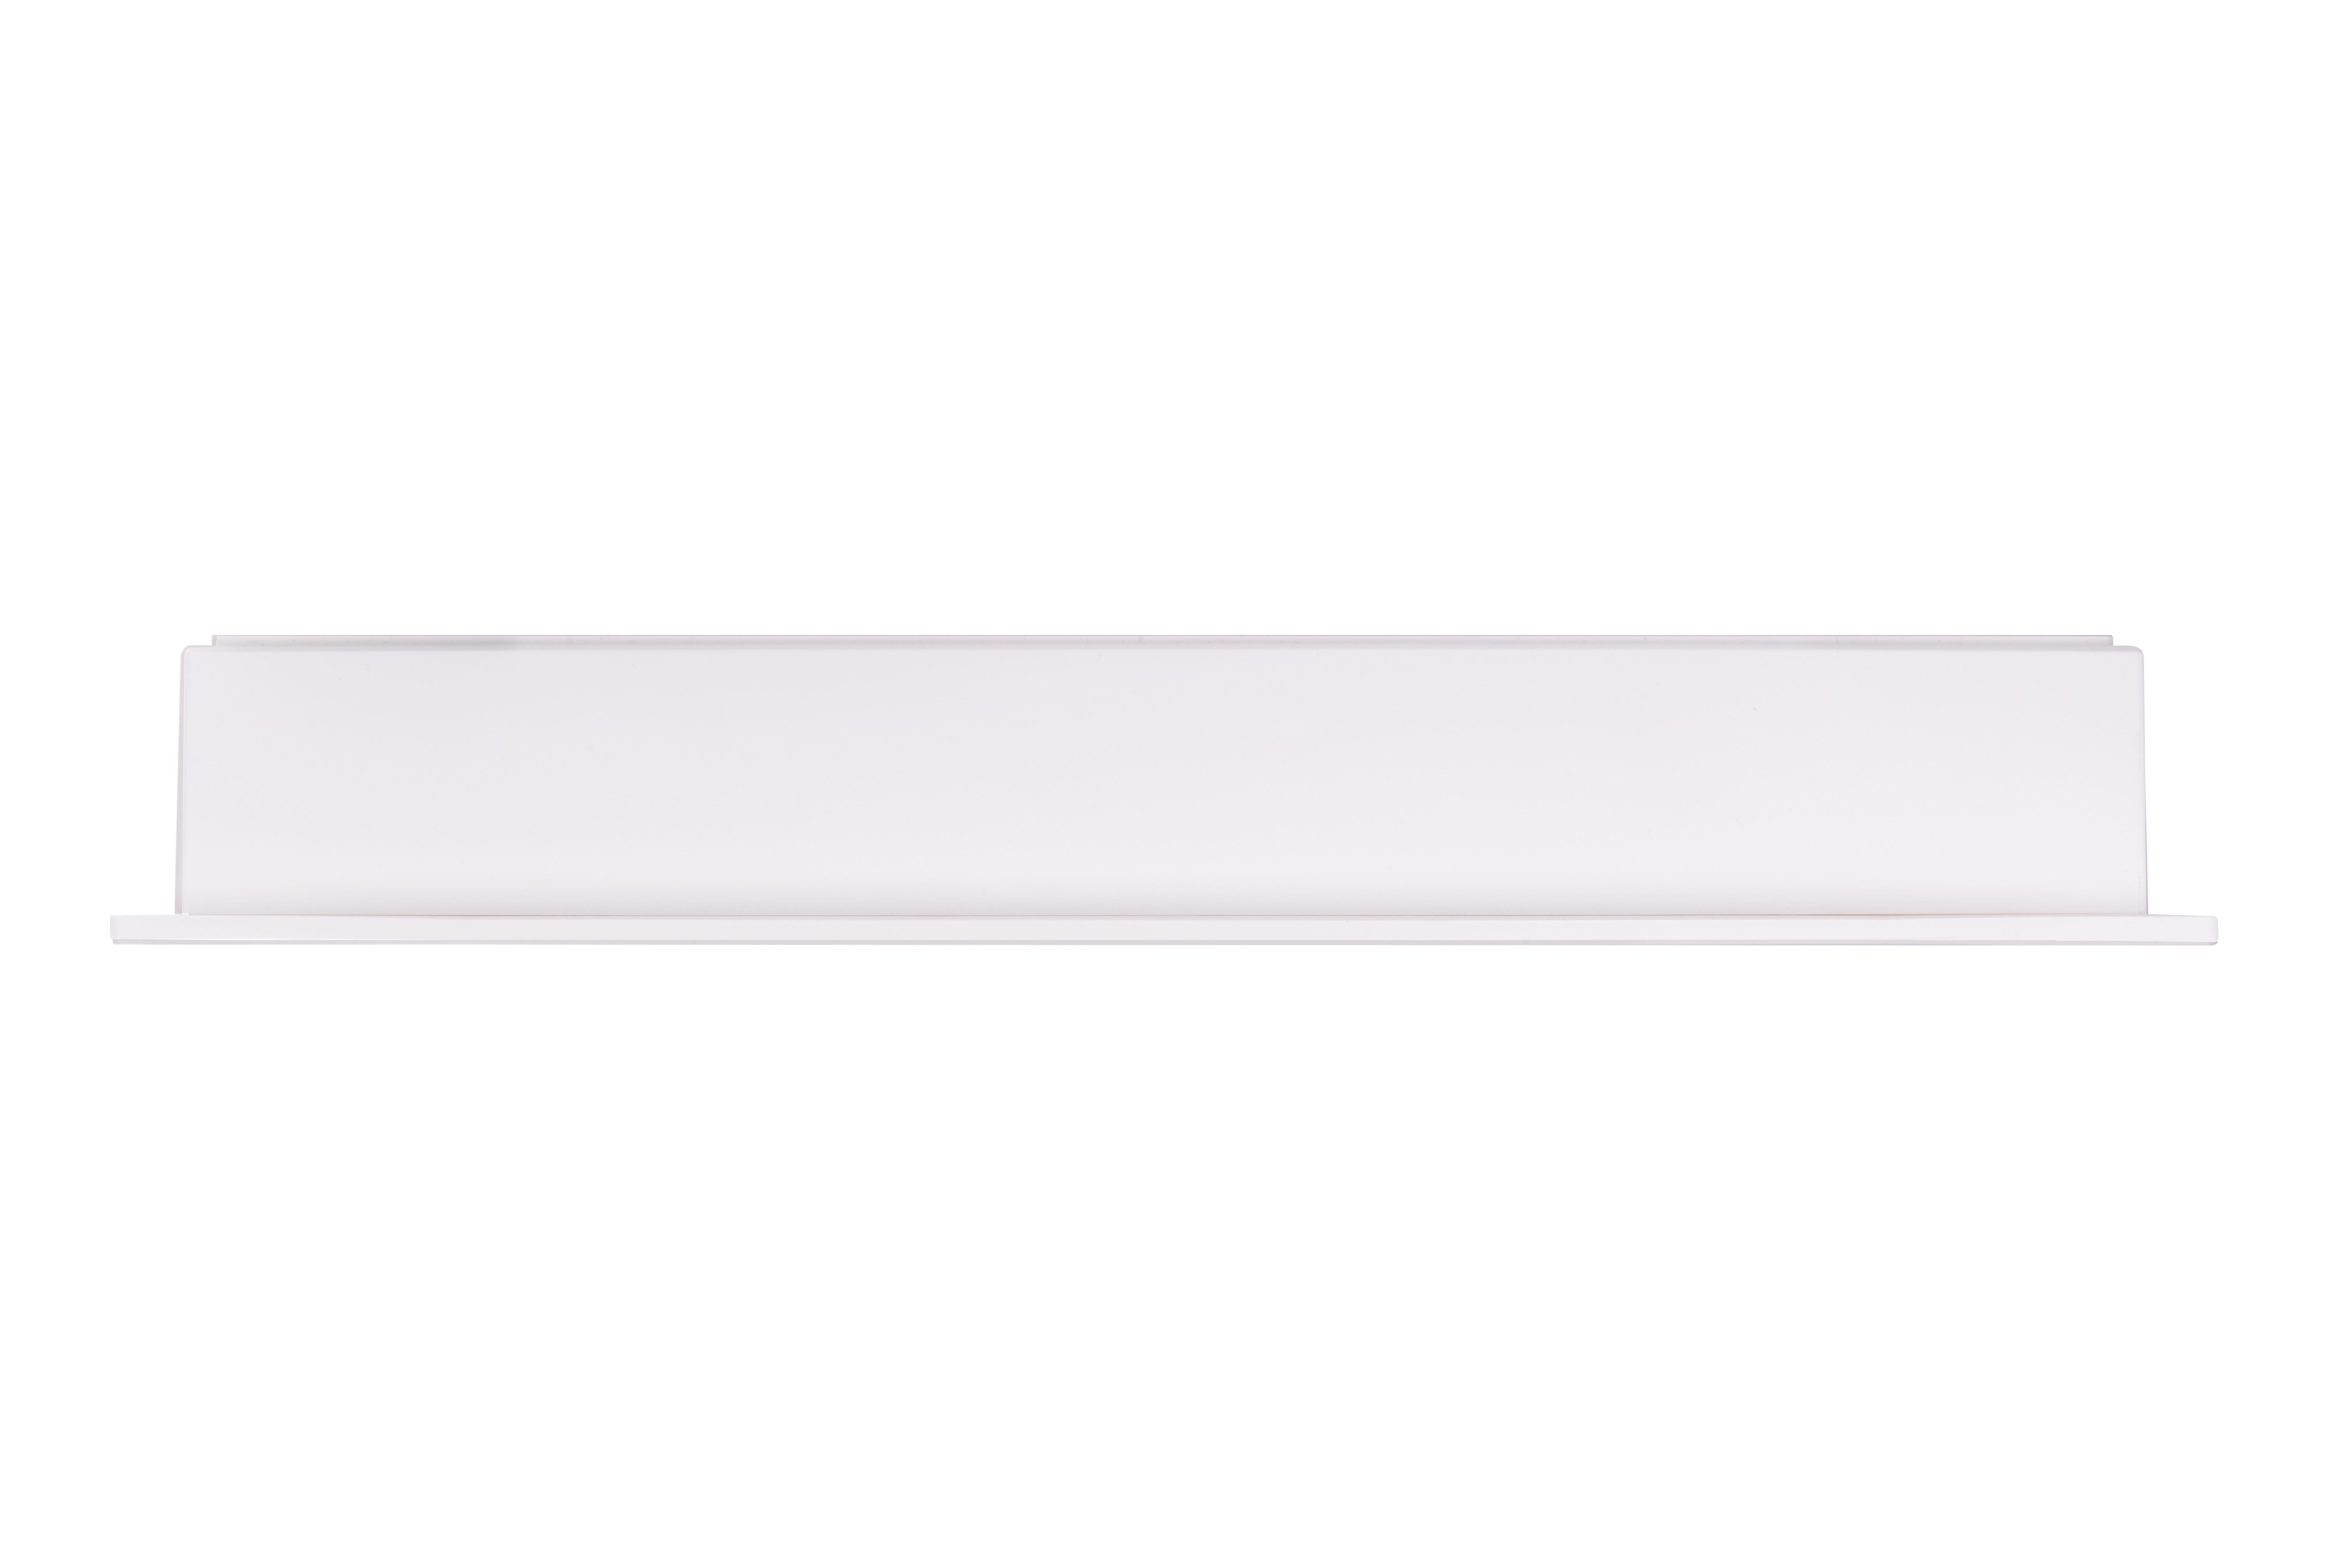 Lampa antipanica led Intelight 94554   3h mentinut test automat 5